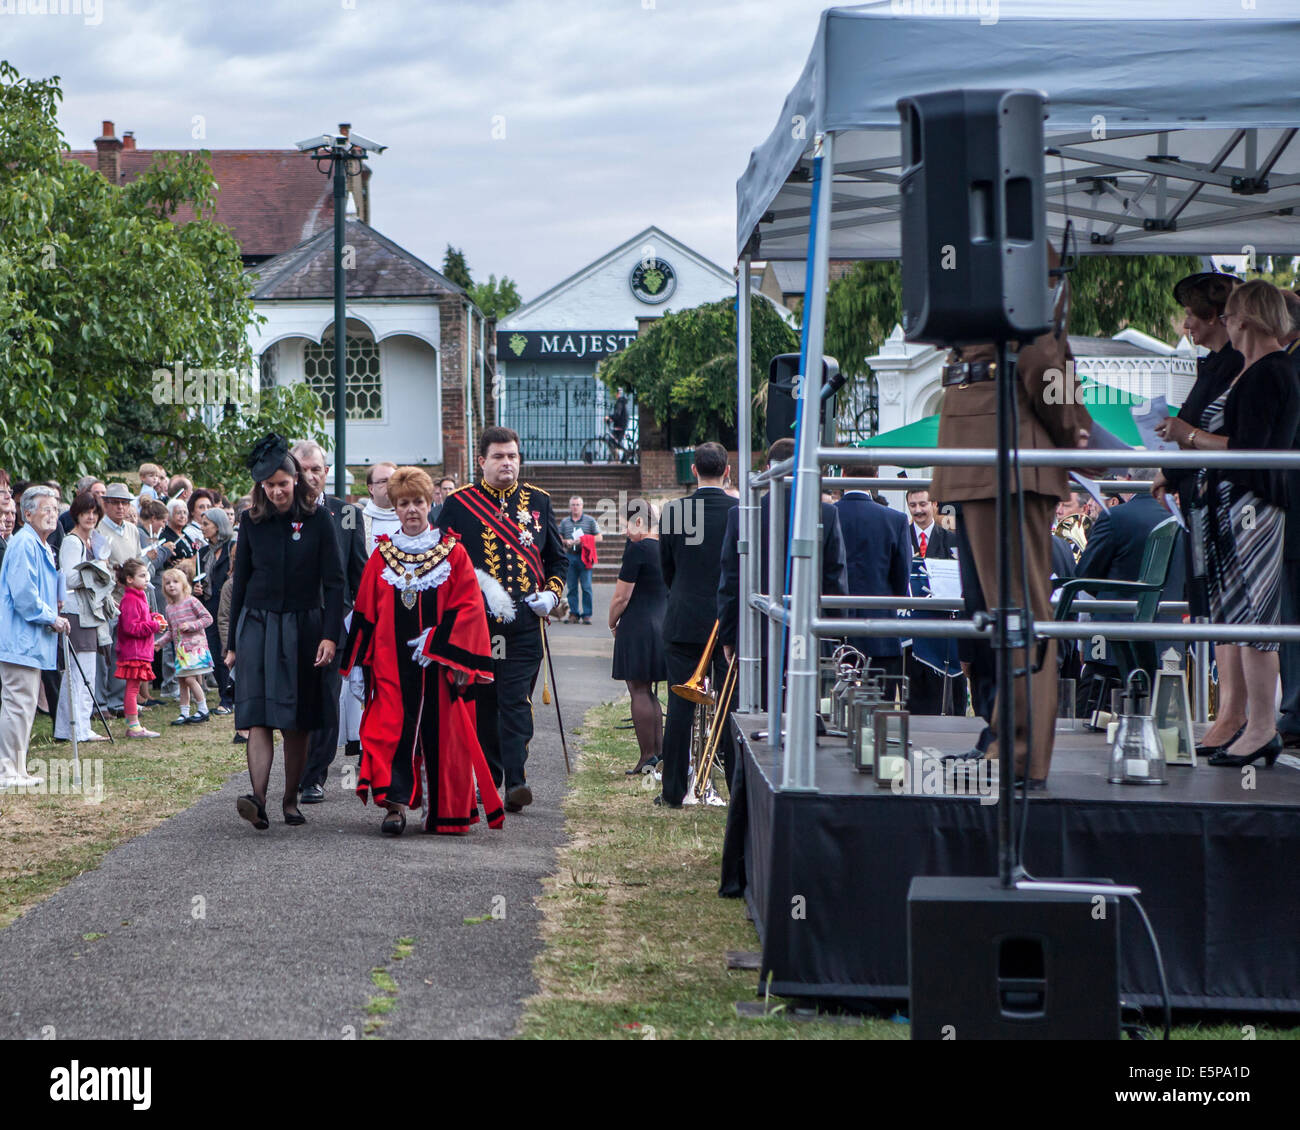 UK, London, Twickenham, Radnor Gardens, 4th August, 2014. A vigil to o commemorate the declaration of war on 4th - Stock Image